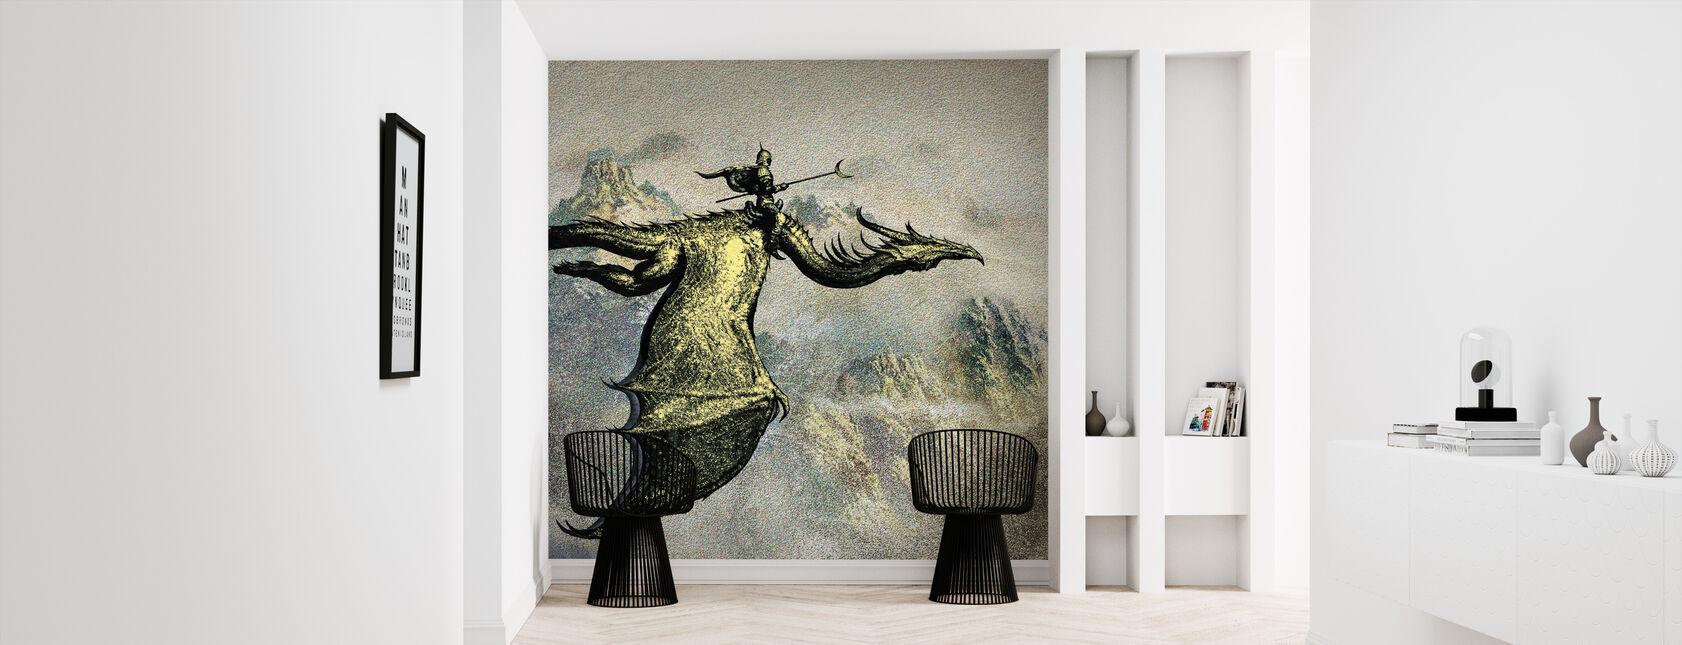 Jockey - Wallpaper - Hallway